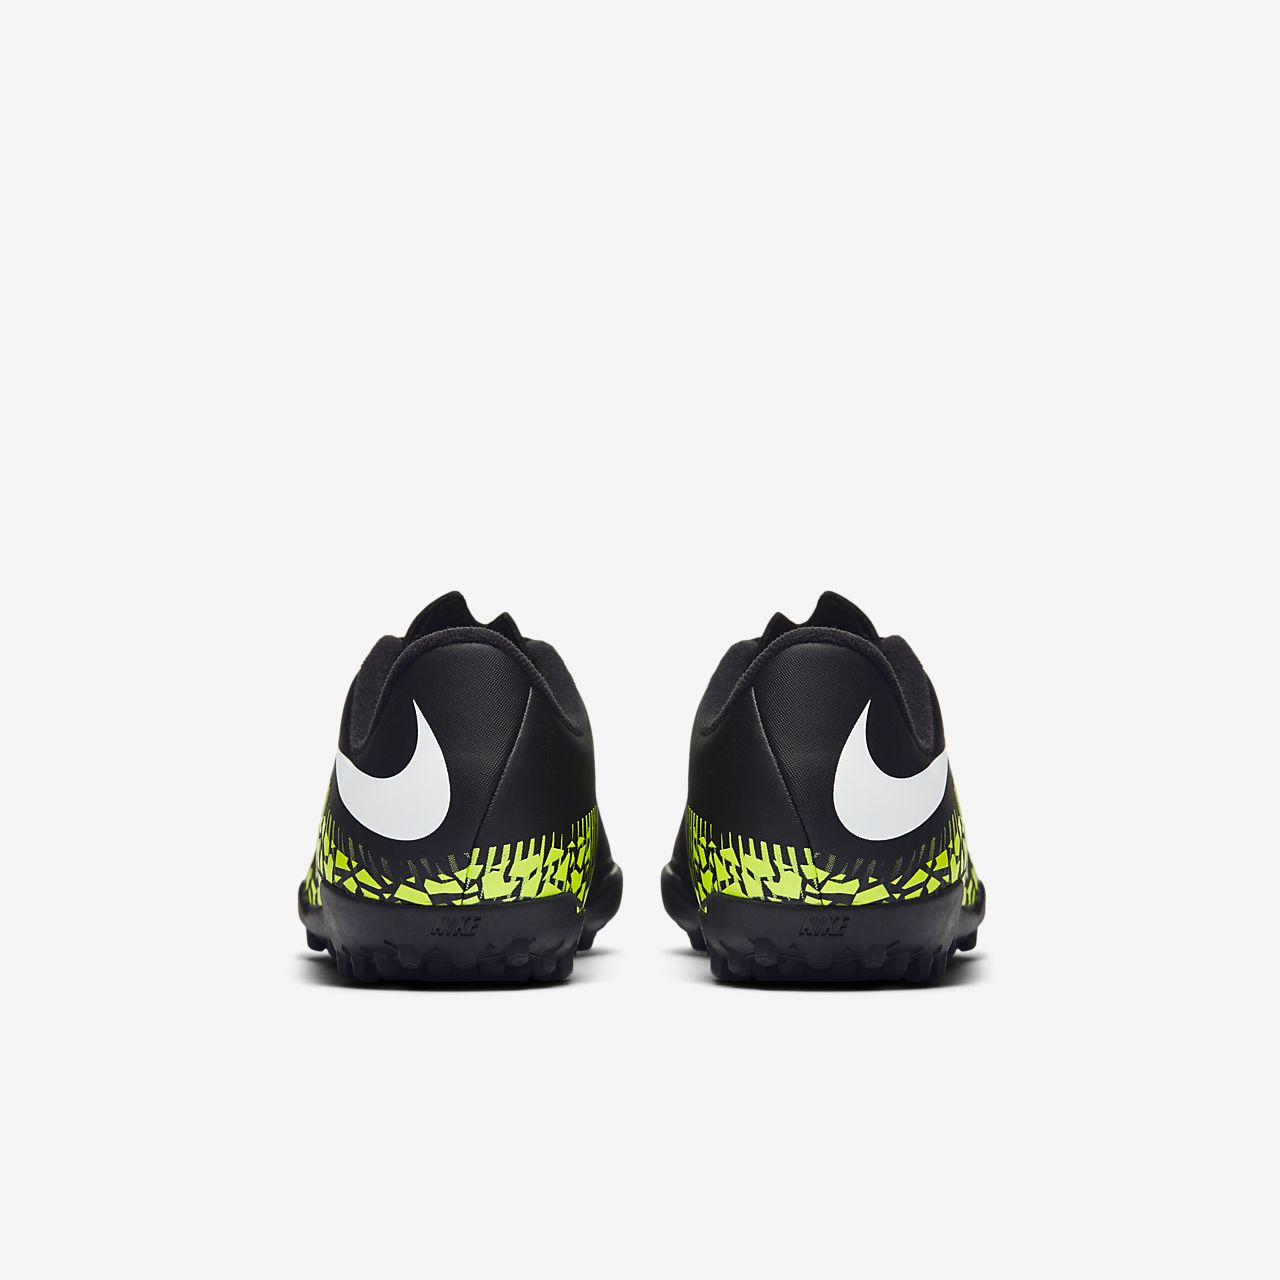 low priced d5236 cbcee ... Nike Jr. Hypervenom Phelon II Younger Kids  Turf Football Shoe (9.5-5.5